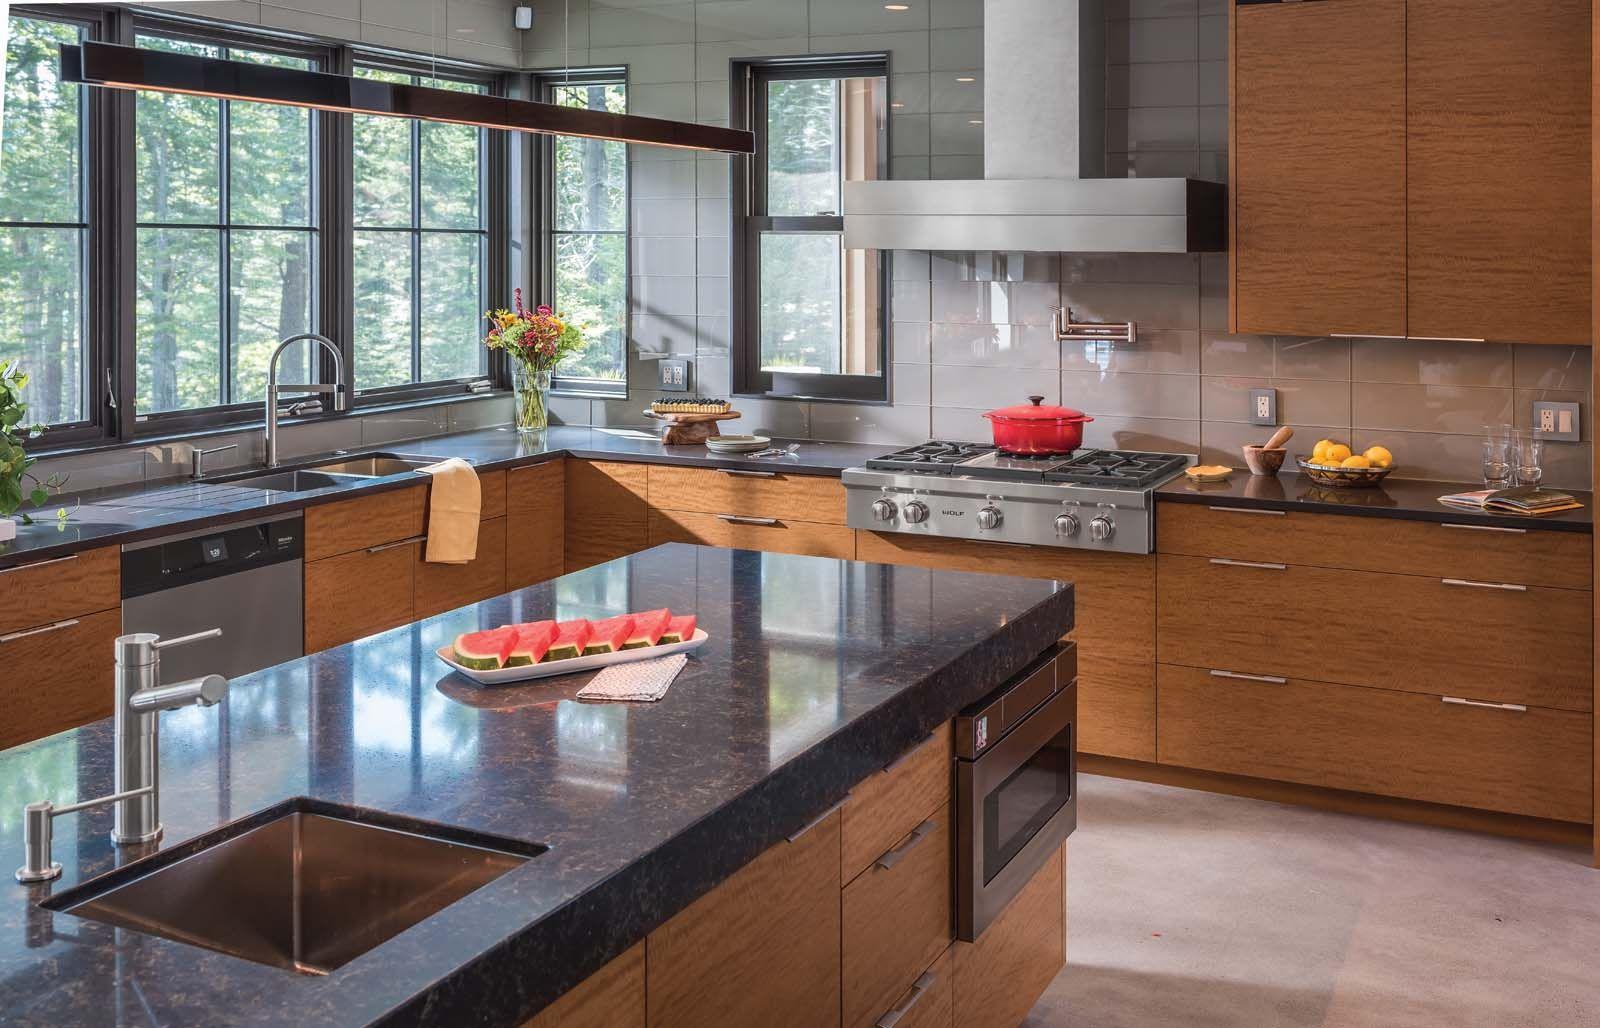 balancing act black quartz countertops house design home decor on kitchen decor black countertop id=83927